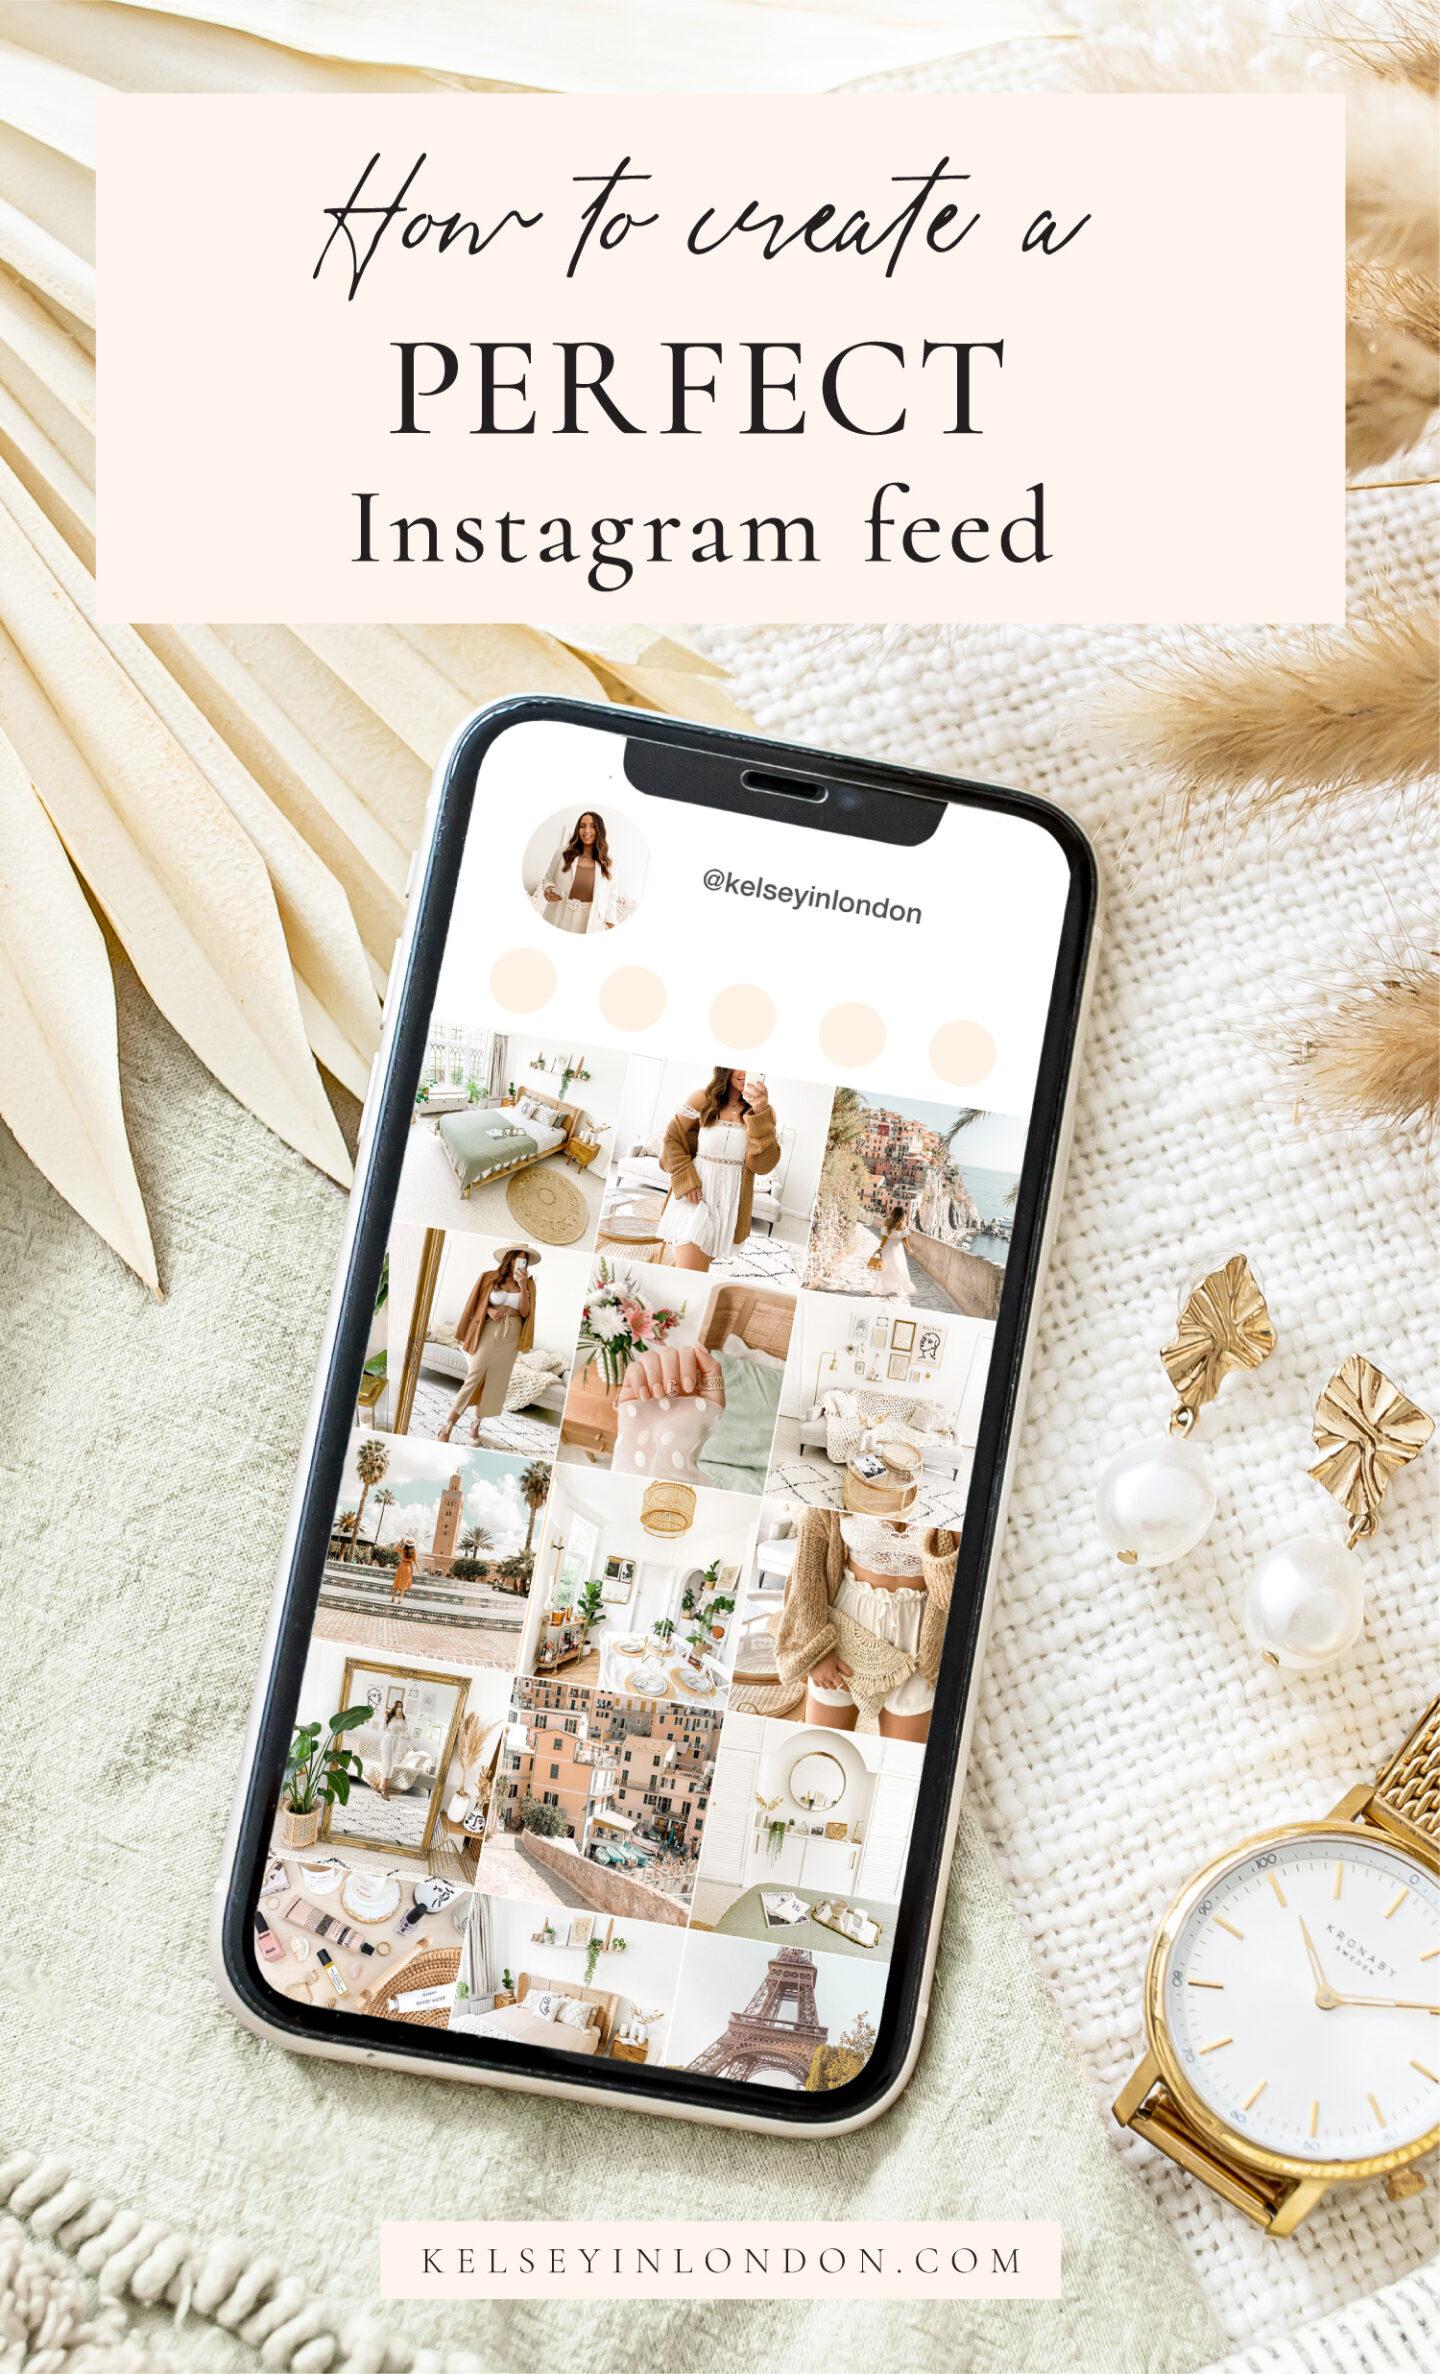 kelseyinlondon-perfect-instagram-feed-theme-lightroom-preset-blogger-influencer-presetsbykelsey-presets-by-kelsey